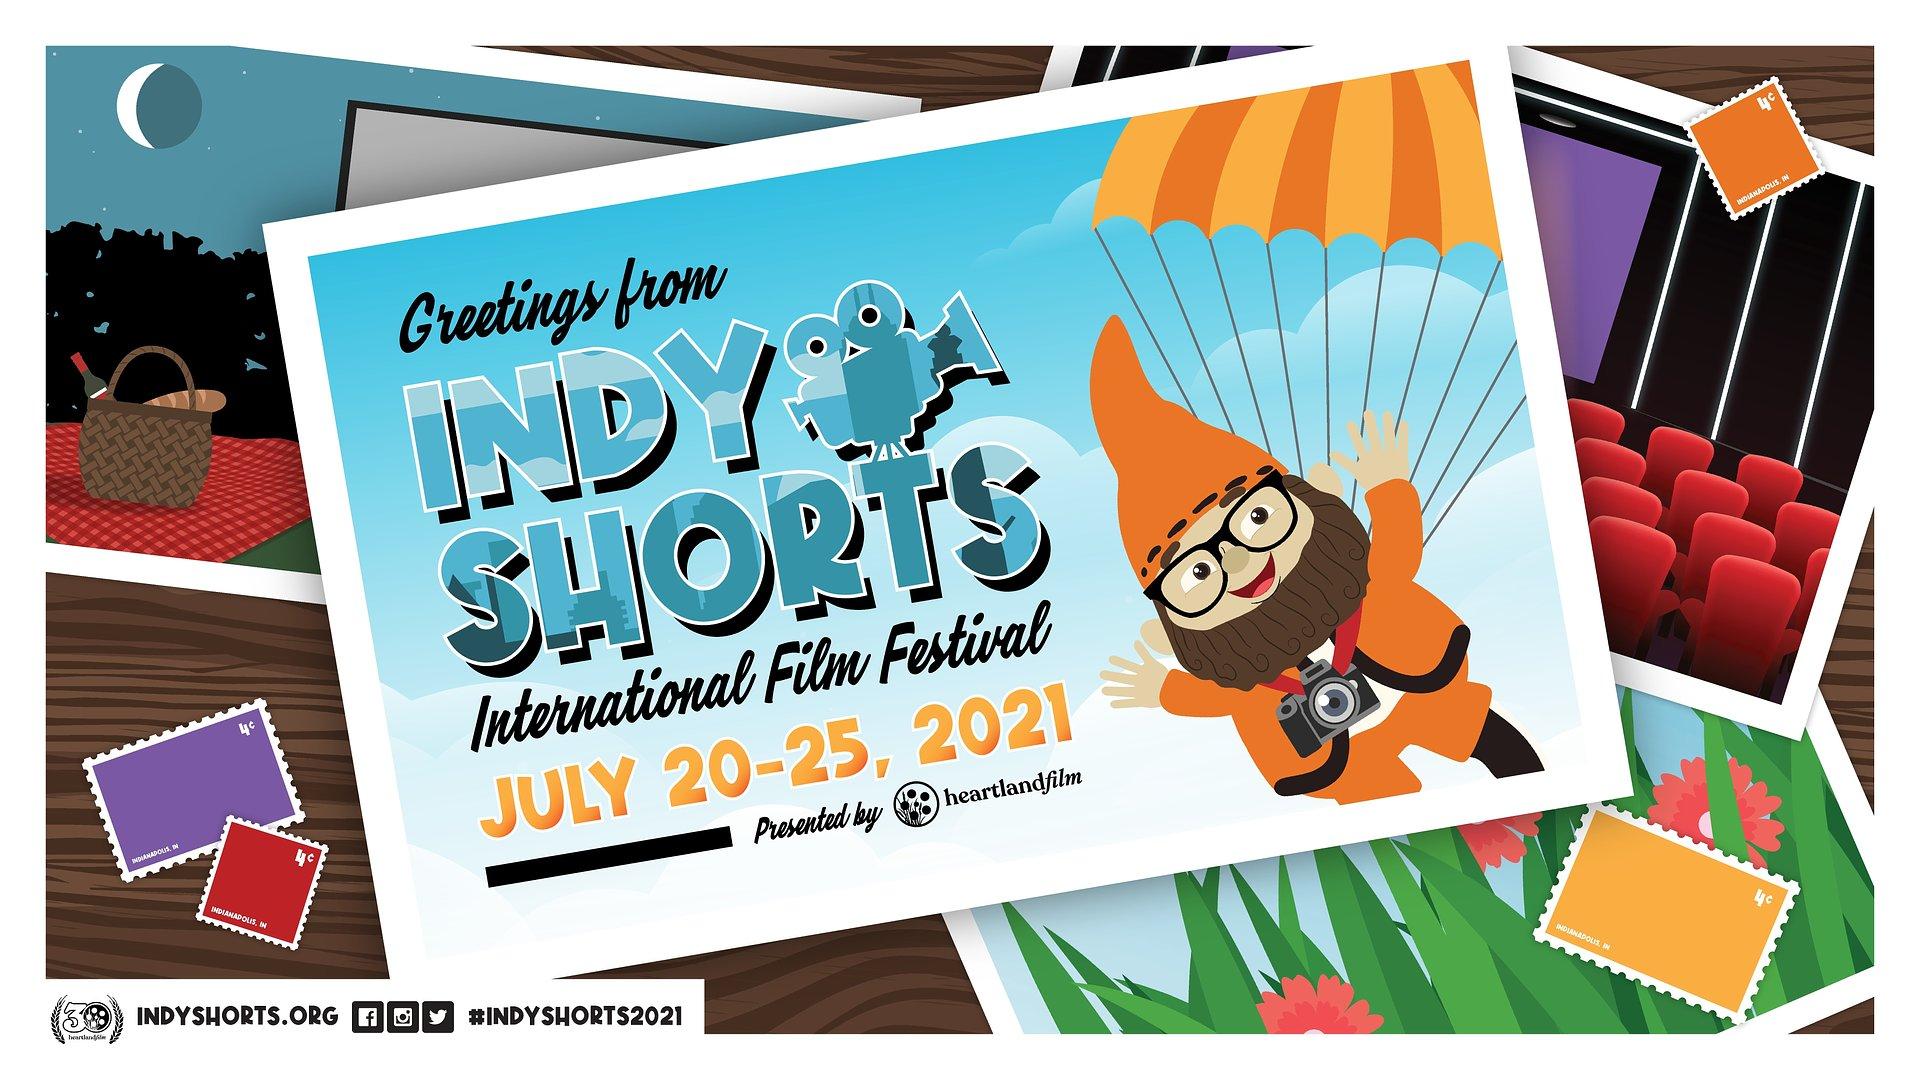 Media Advisory: The Academy Award®-Qualifying Indy Shorts International Film Festival kicks off today!